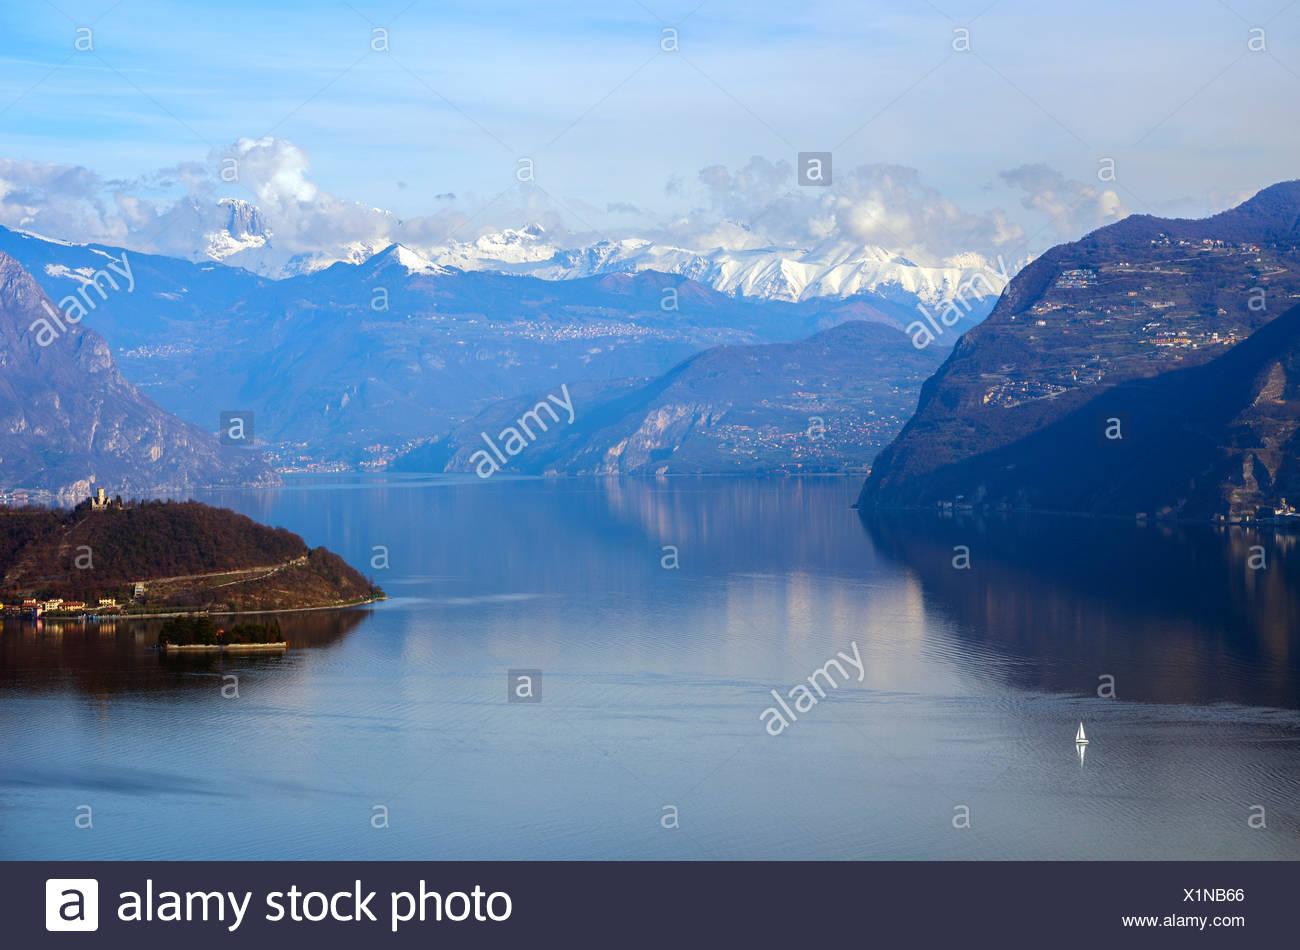 Iseo lake, province of Brescia, Italy - Stock Image